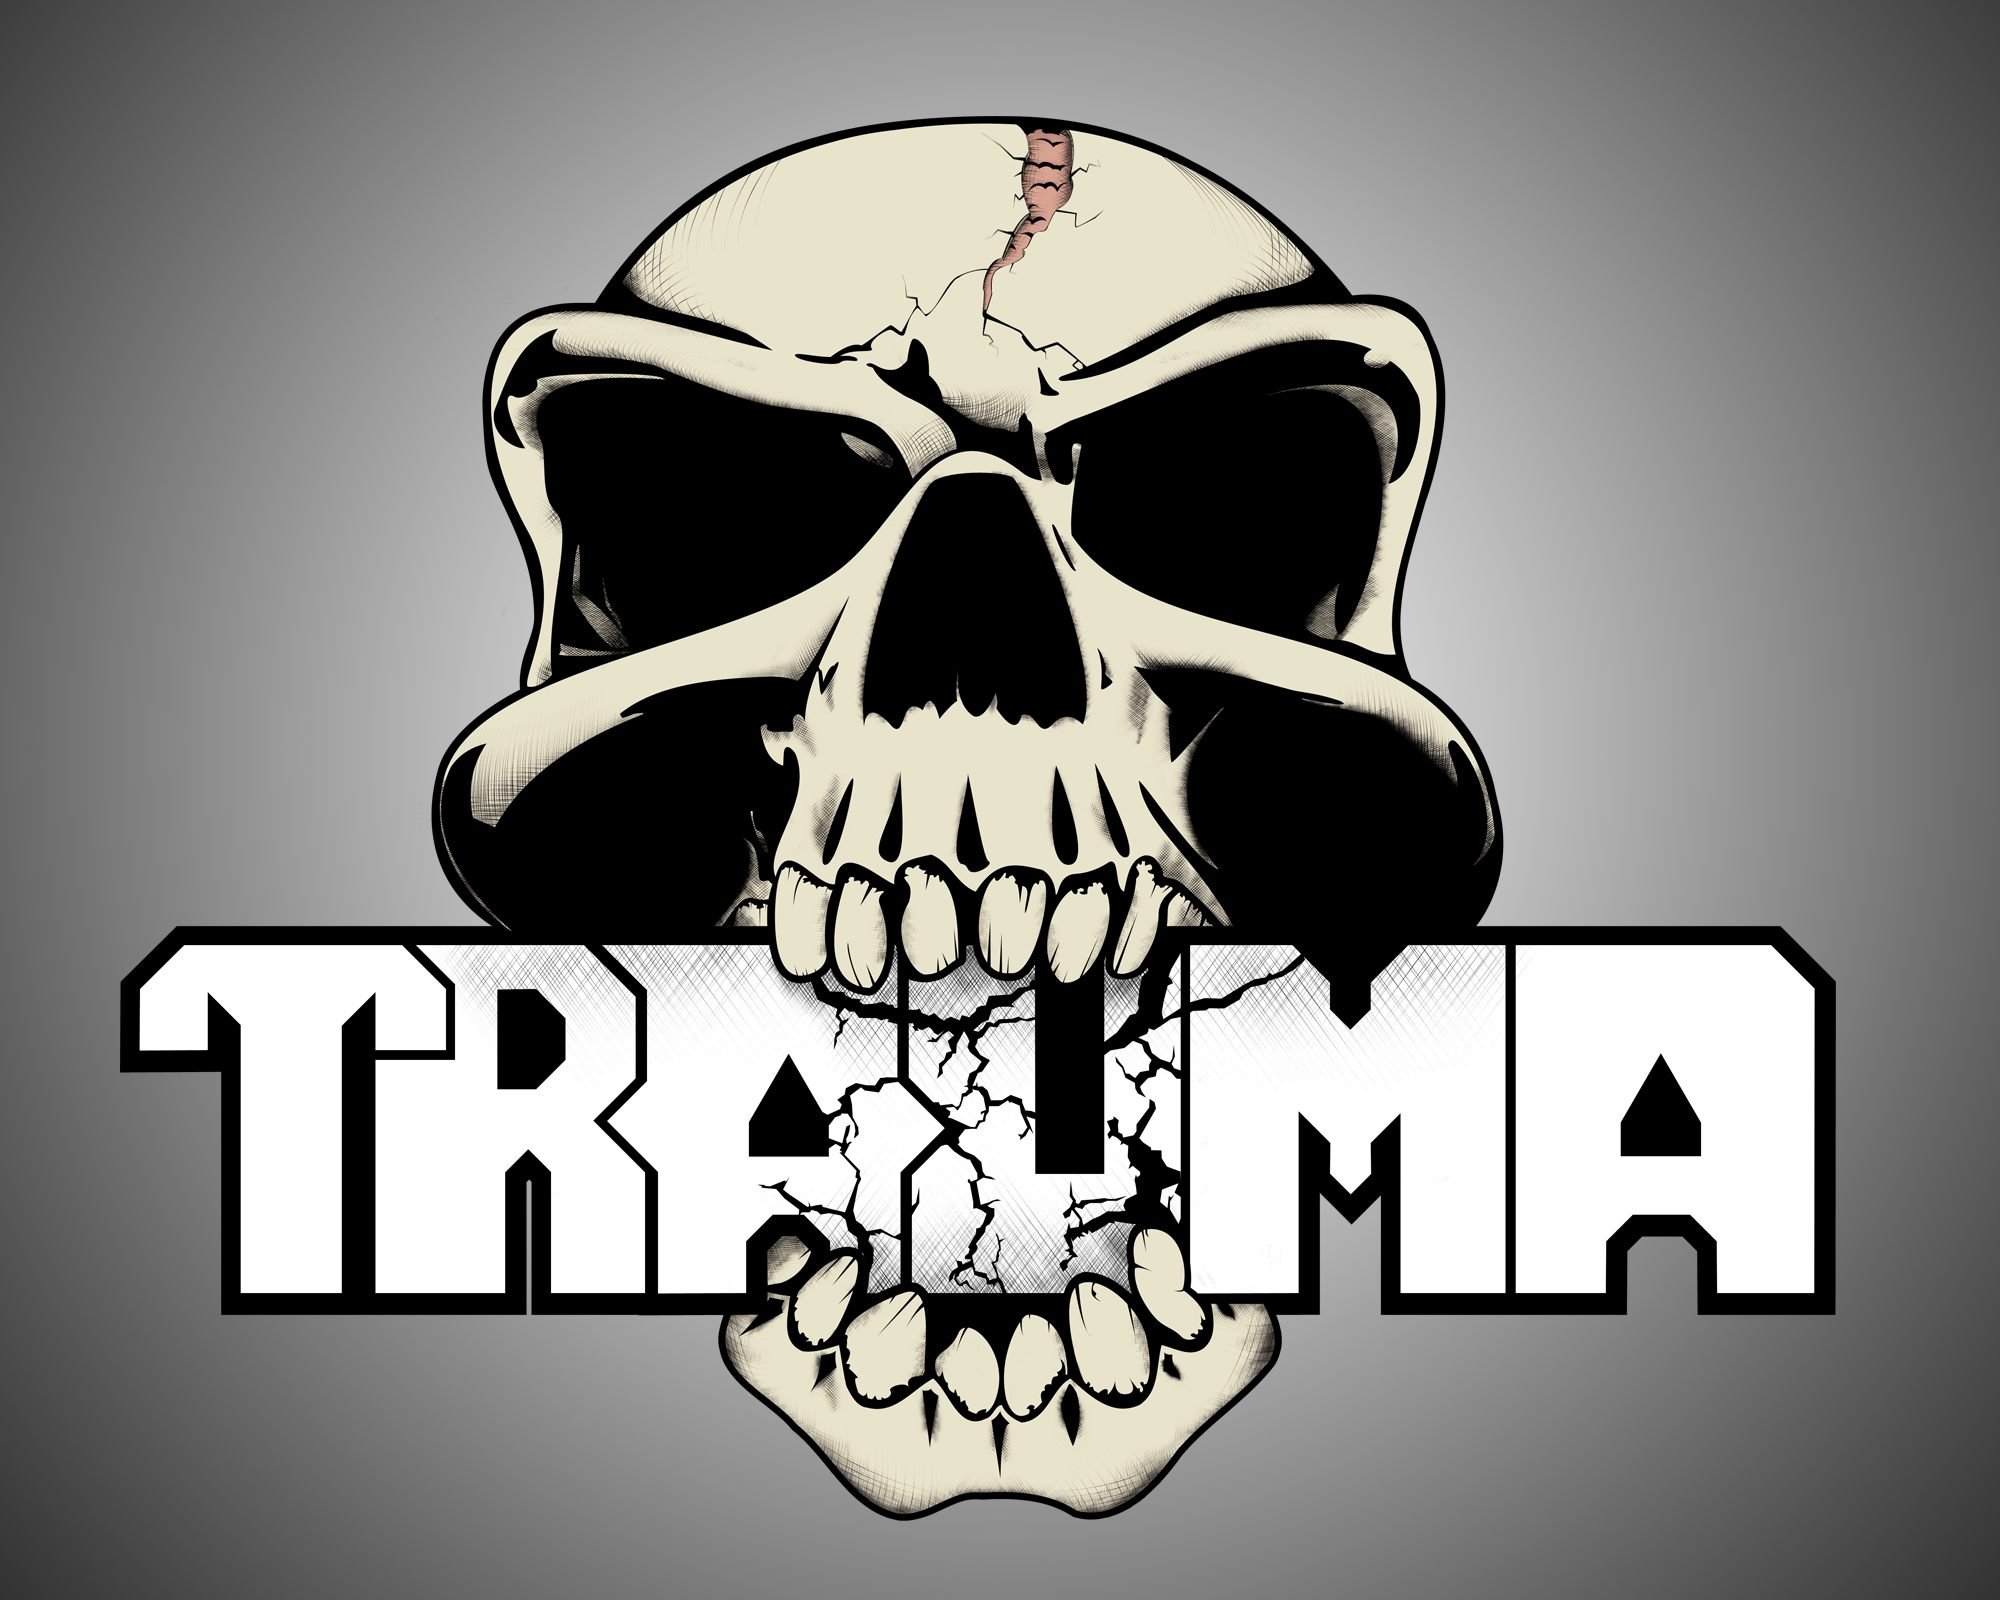 Trauma Logo by WhittlingDesigns on DeviantArt